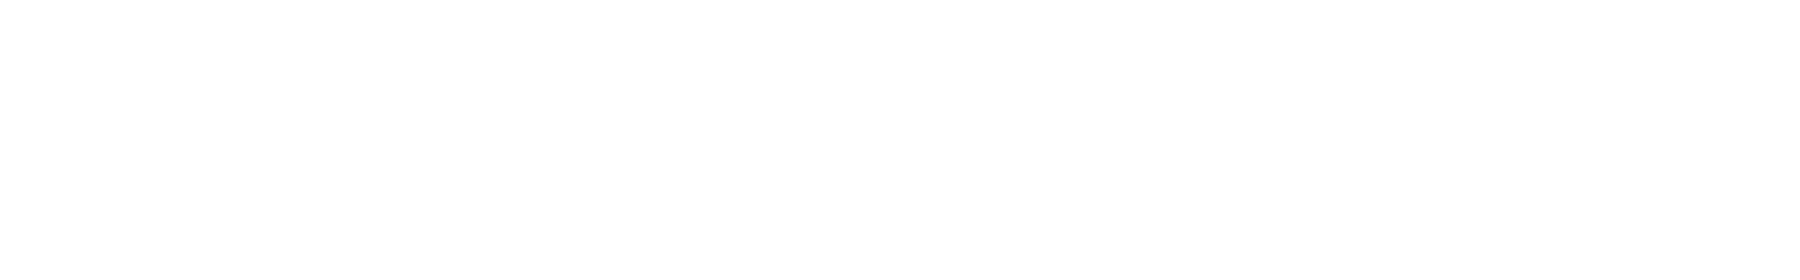 vedh bass cut 056 d